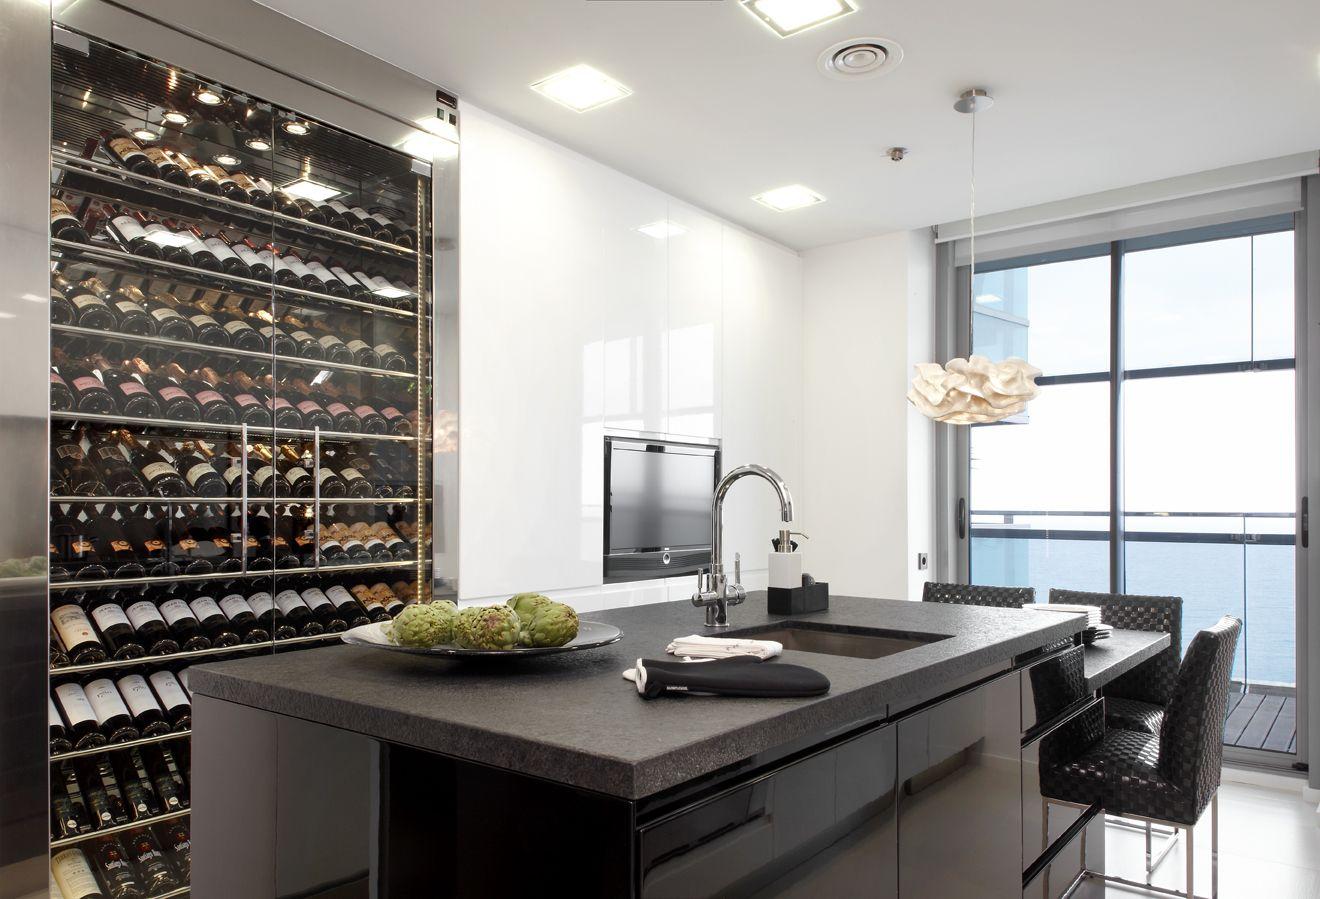 Molins interiors arquitectura interior cocina isla for Cocina definicion arquitectura